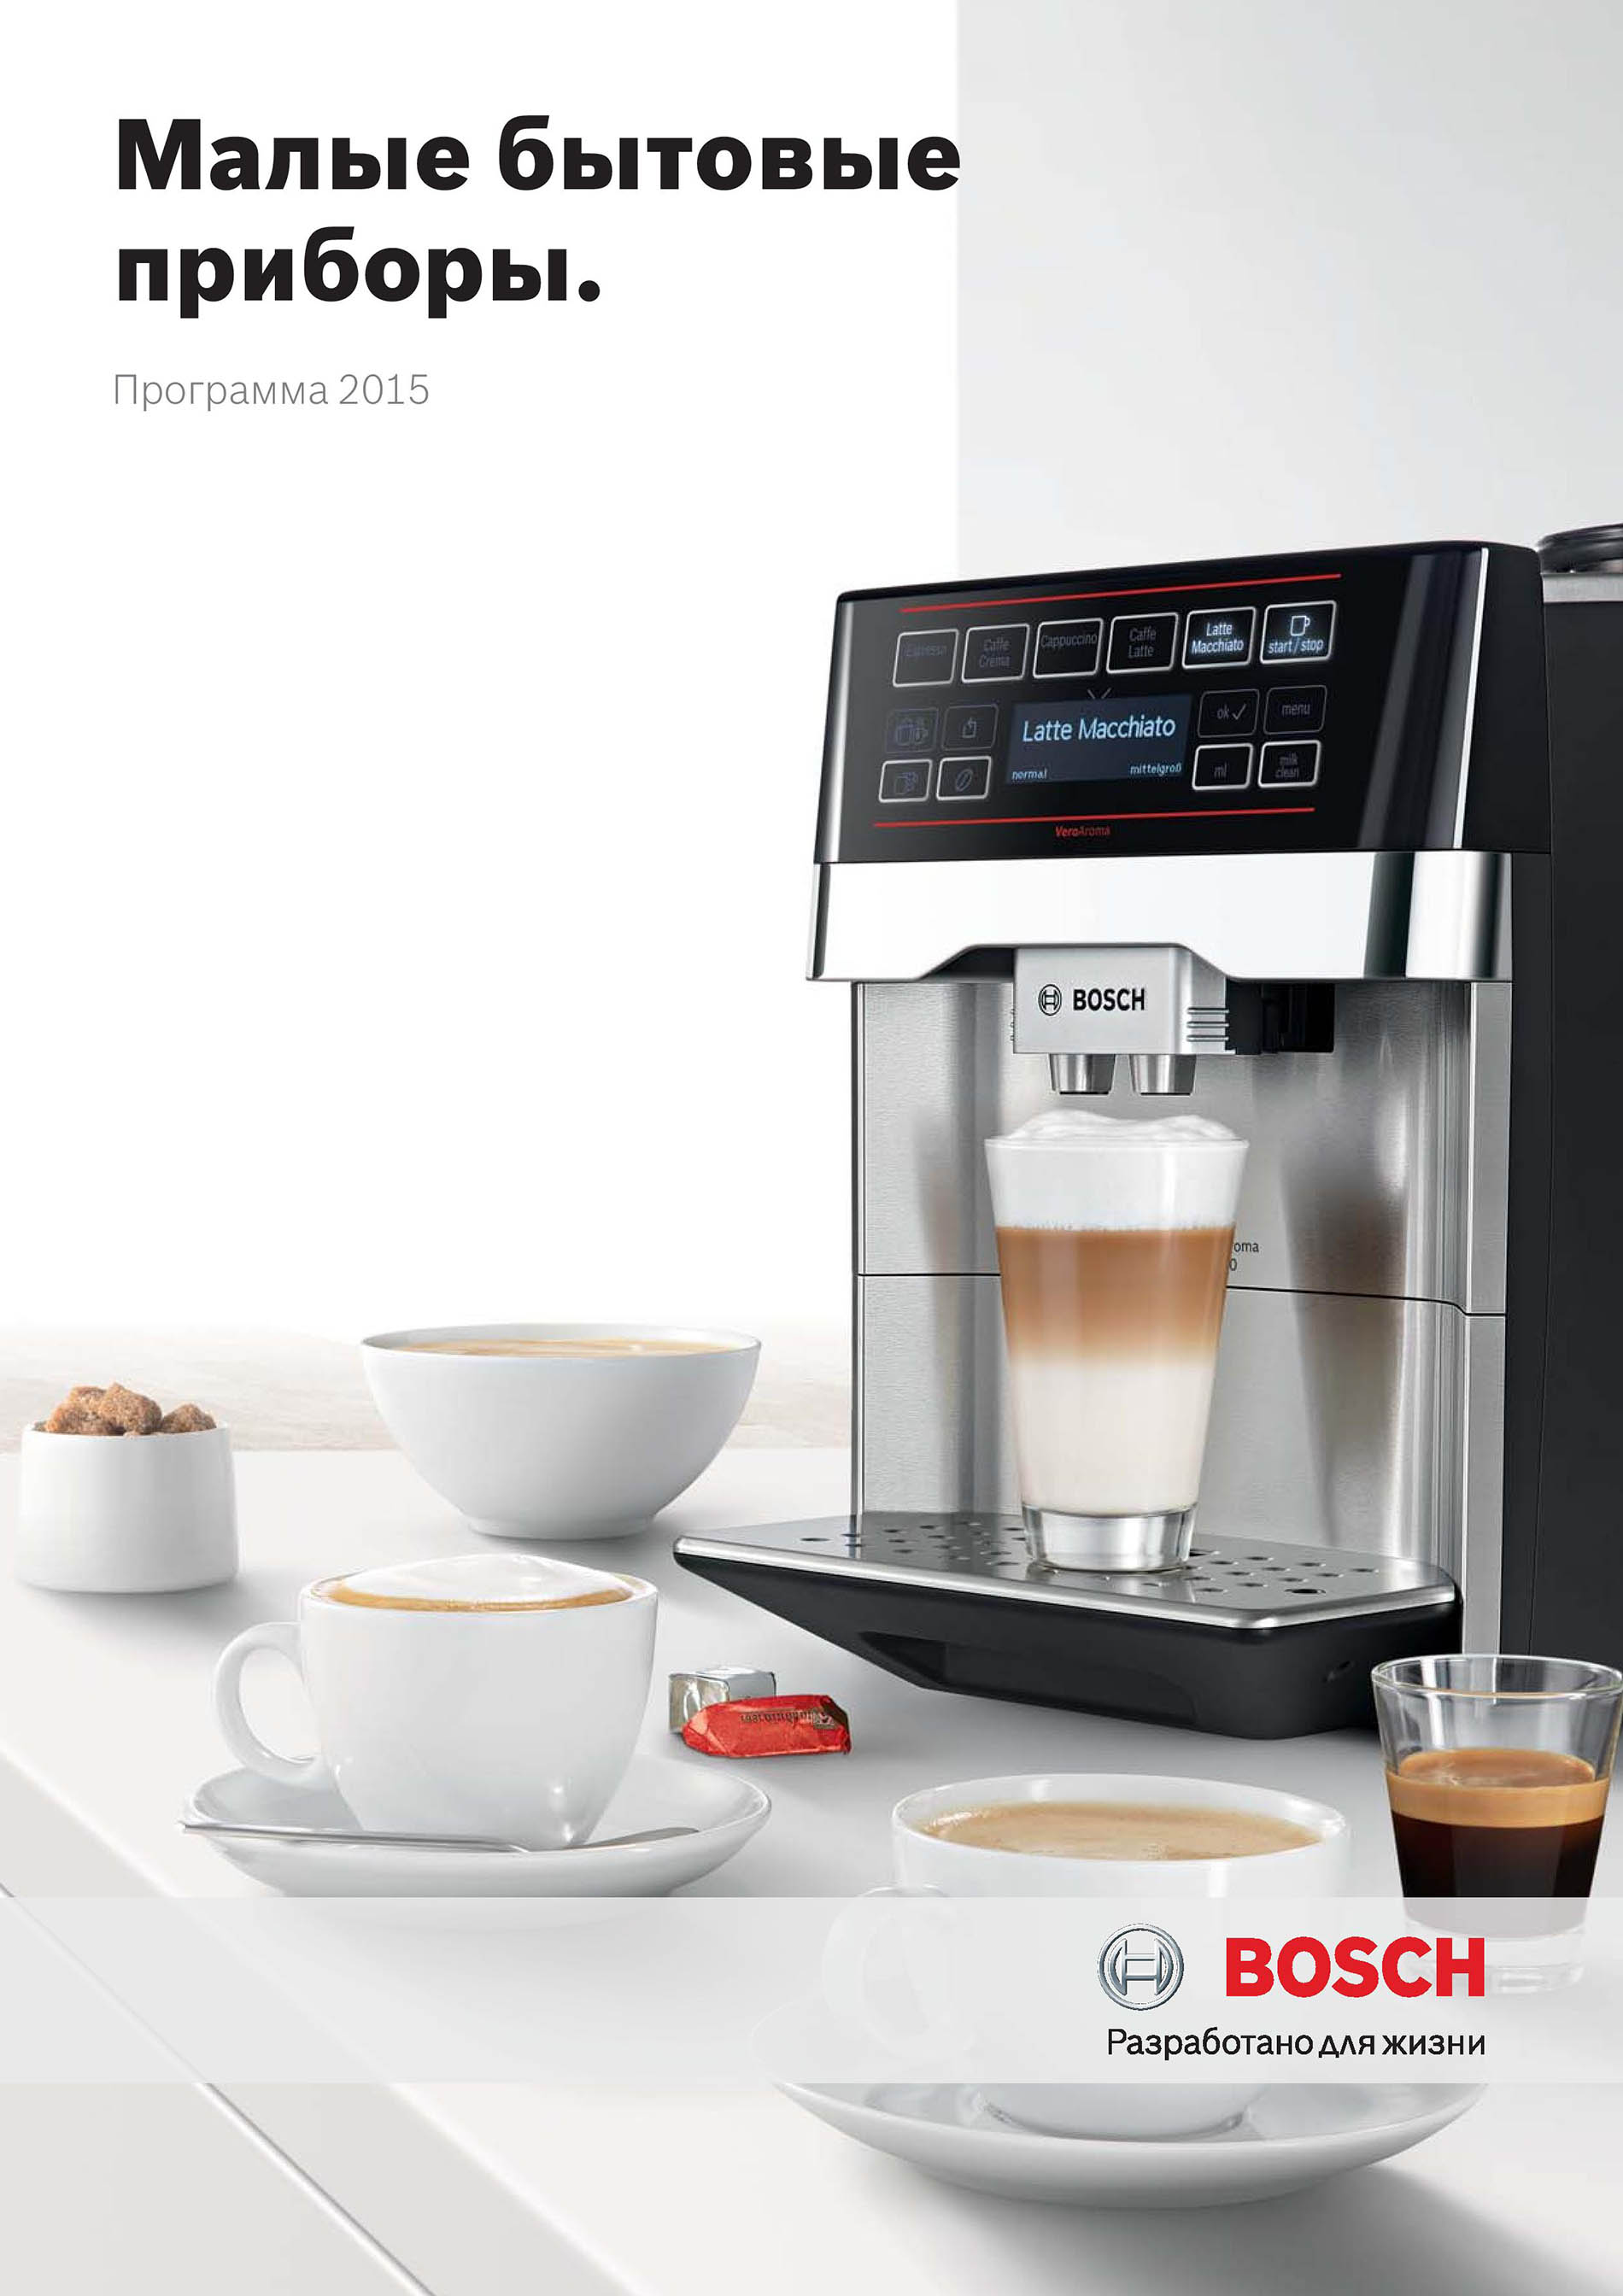 каталог техники Bosch 2015